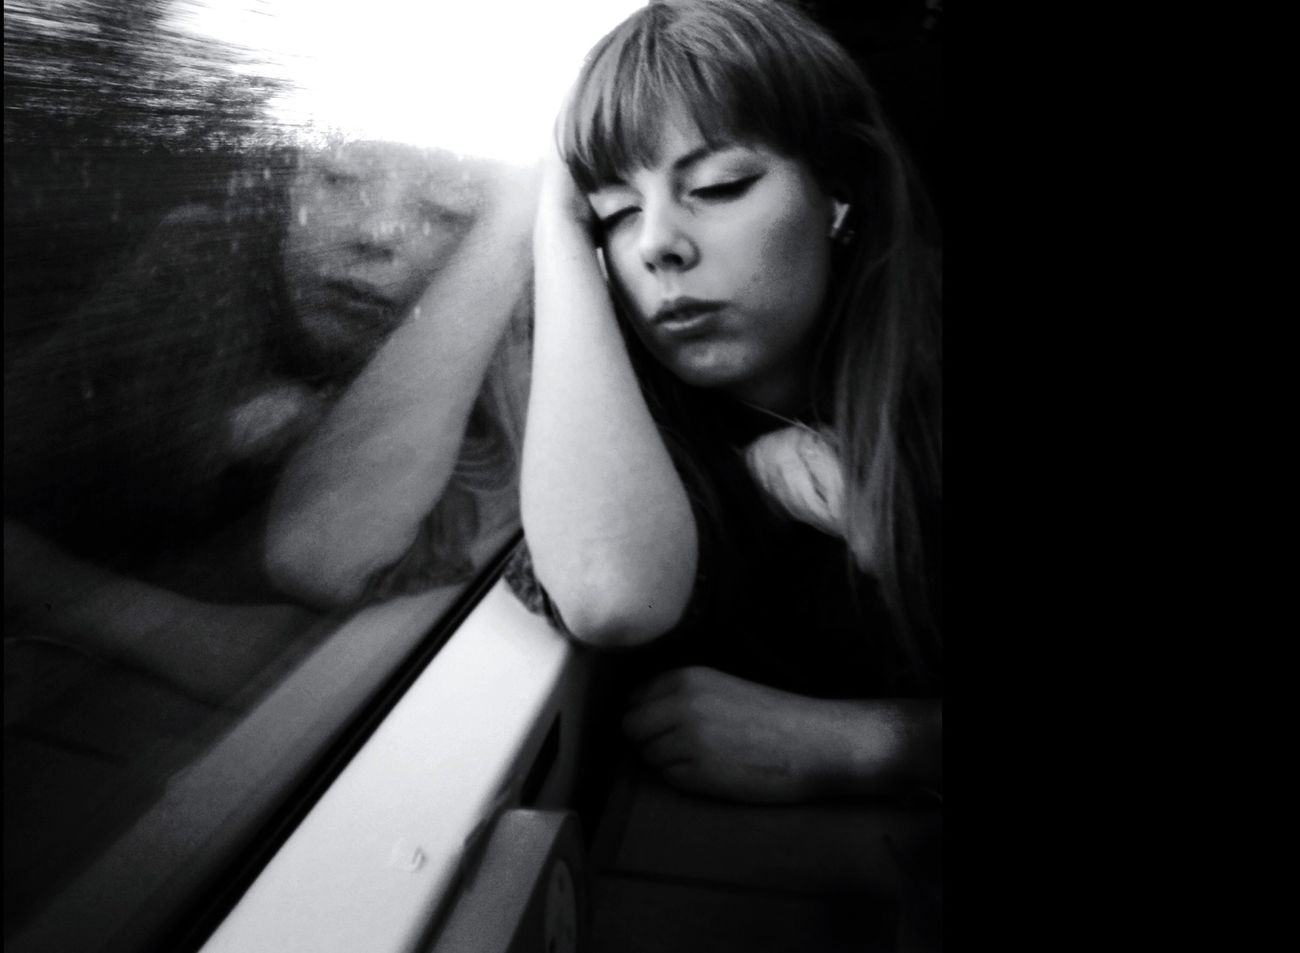 Monochrome Shootermag Blackandwhite Eye4photography  Eyeforphotography Mono Portrait Beauty Sleeping